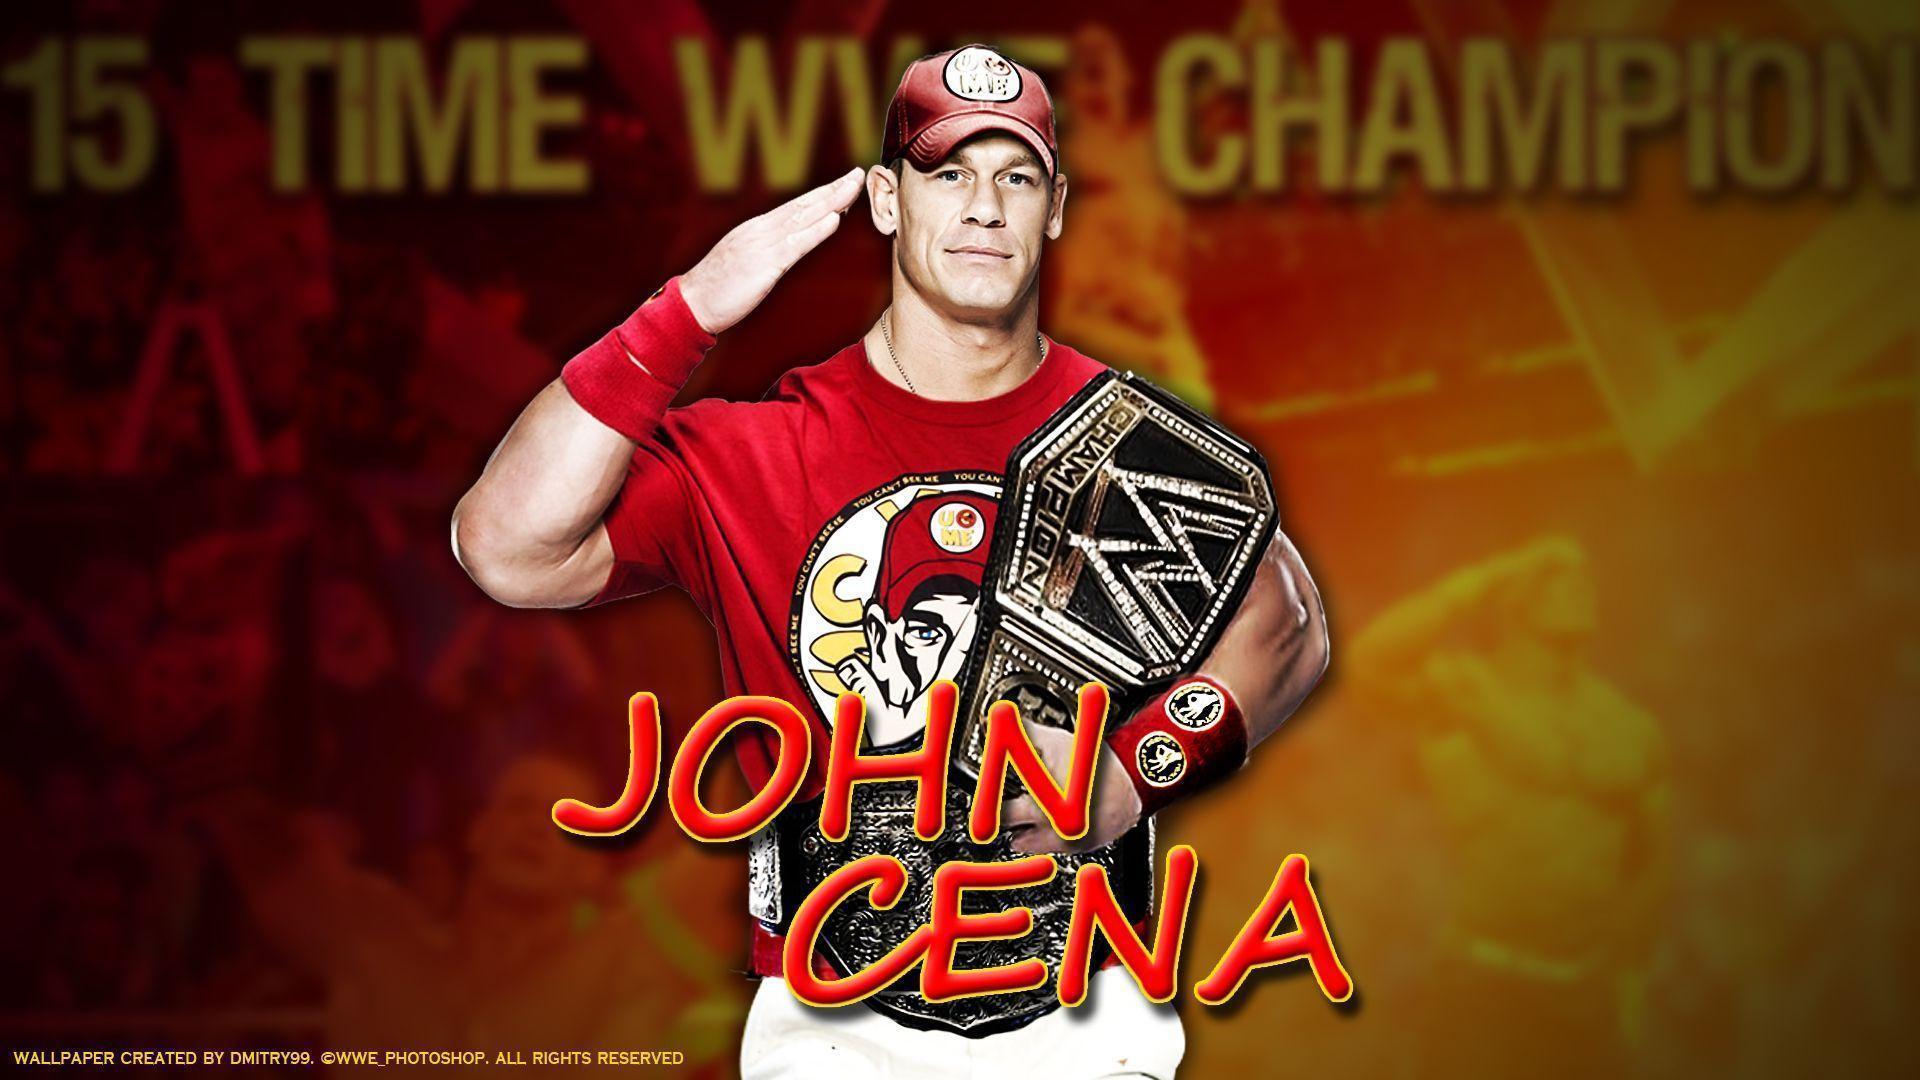 John Cena Wallpapers 2017 For Desktop HD - Wallpaper Cave